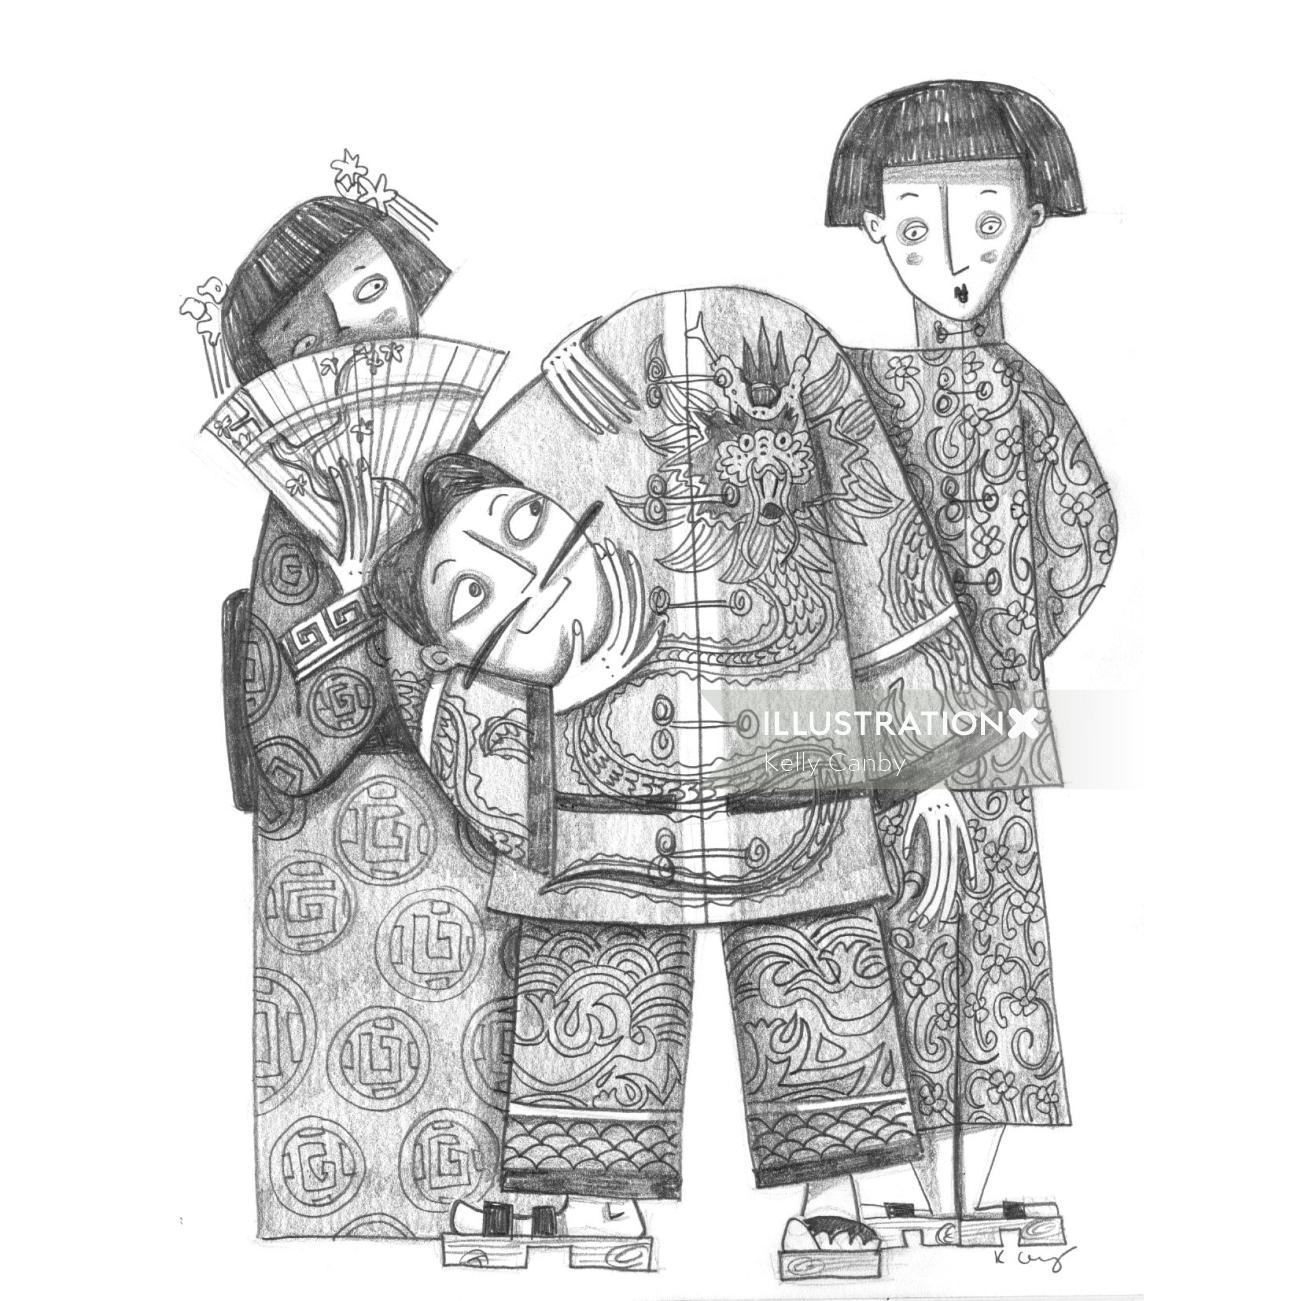 Line illustration of Japanese people